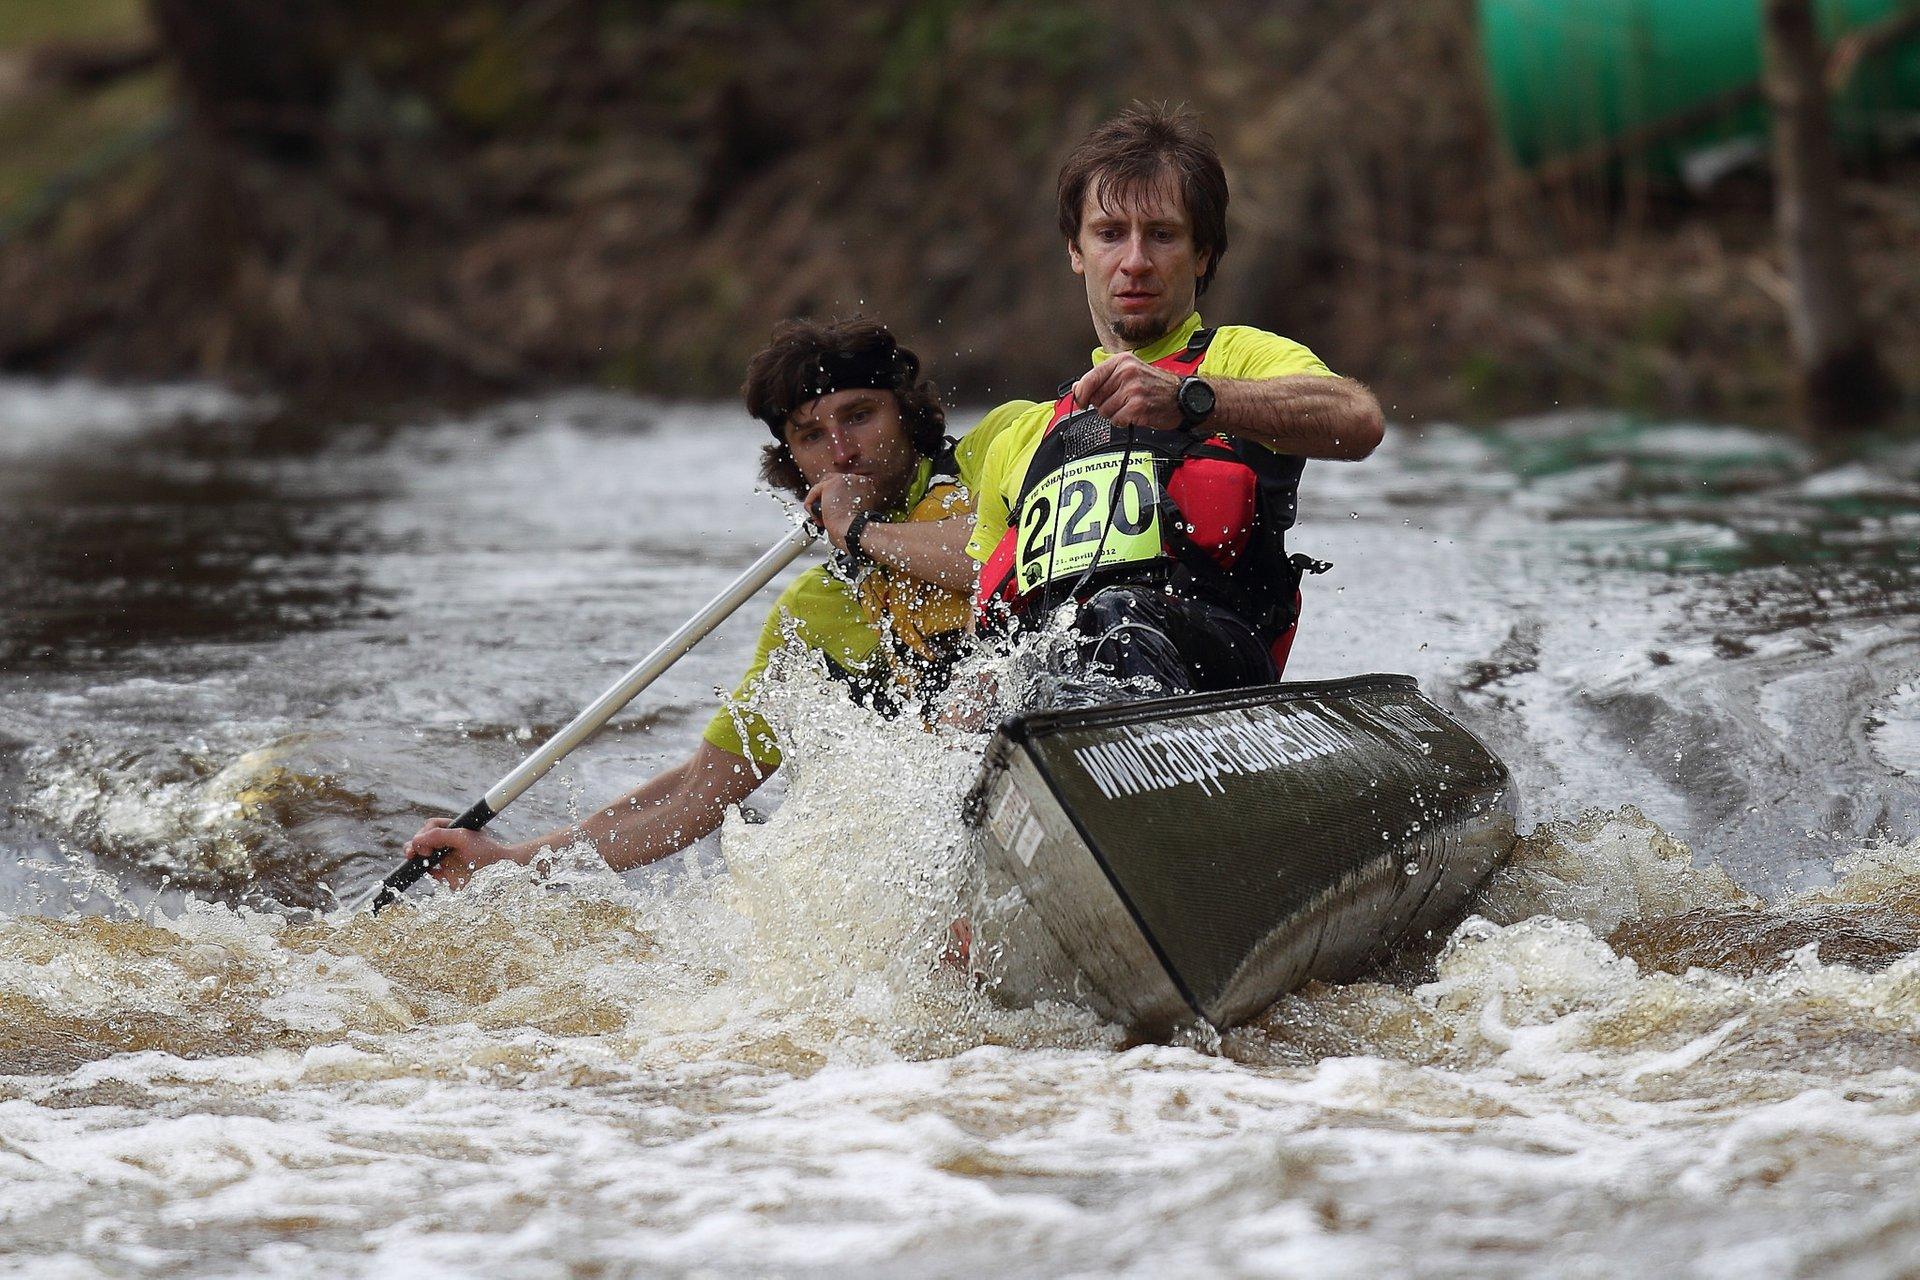 Võhandu Marathon in Estonia - Best Season 2020